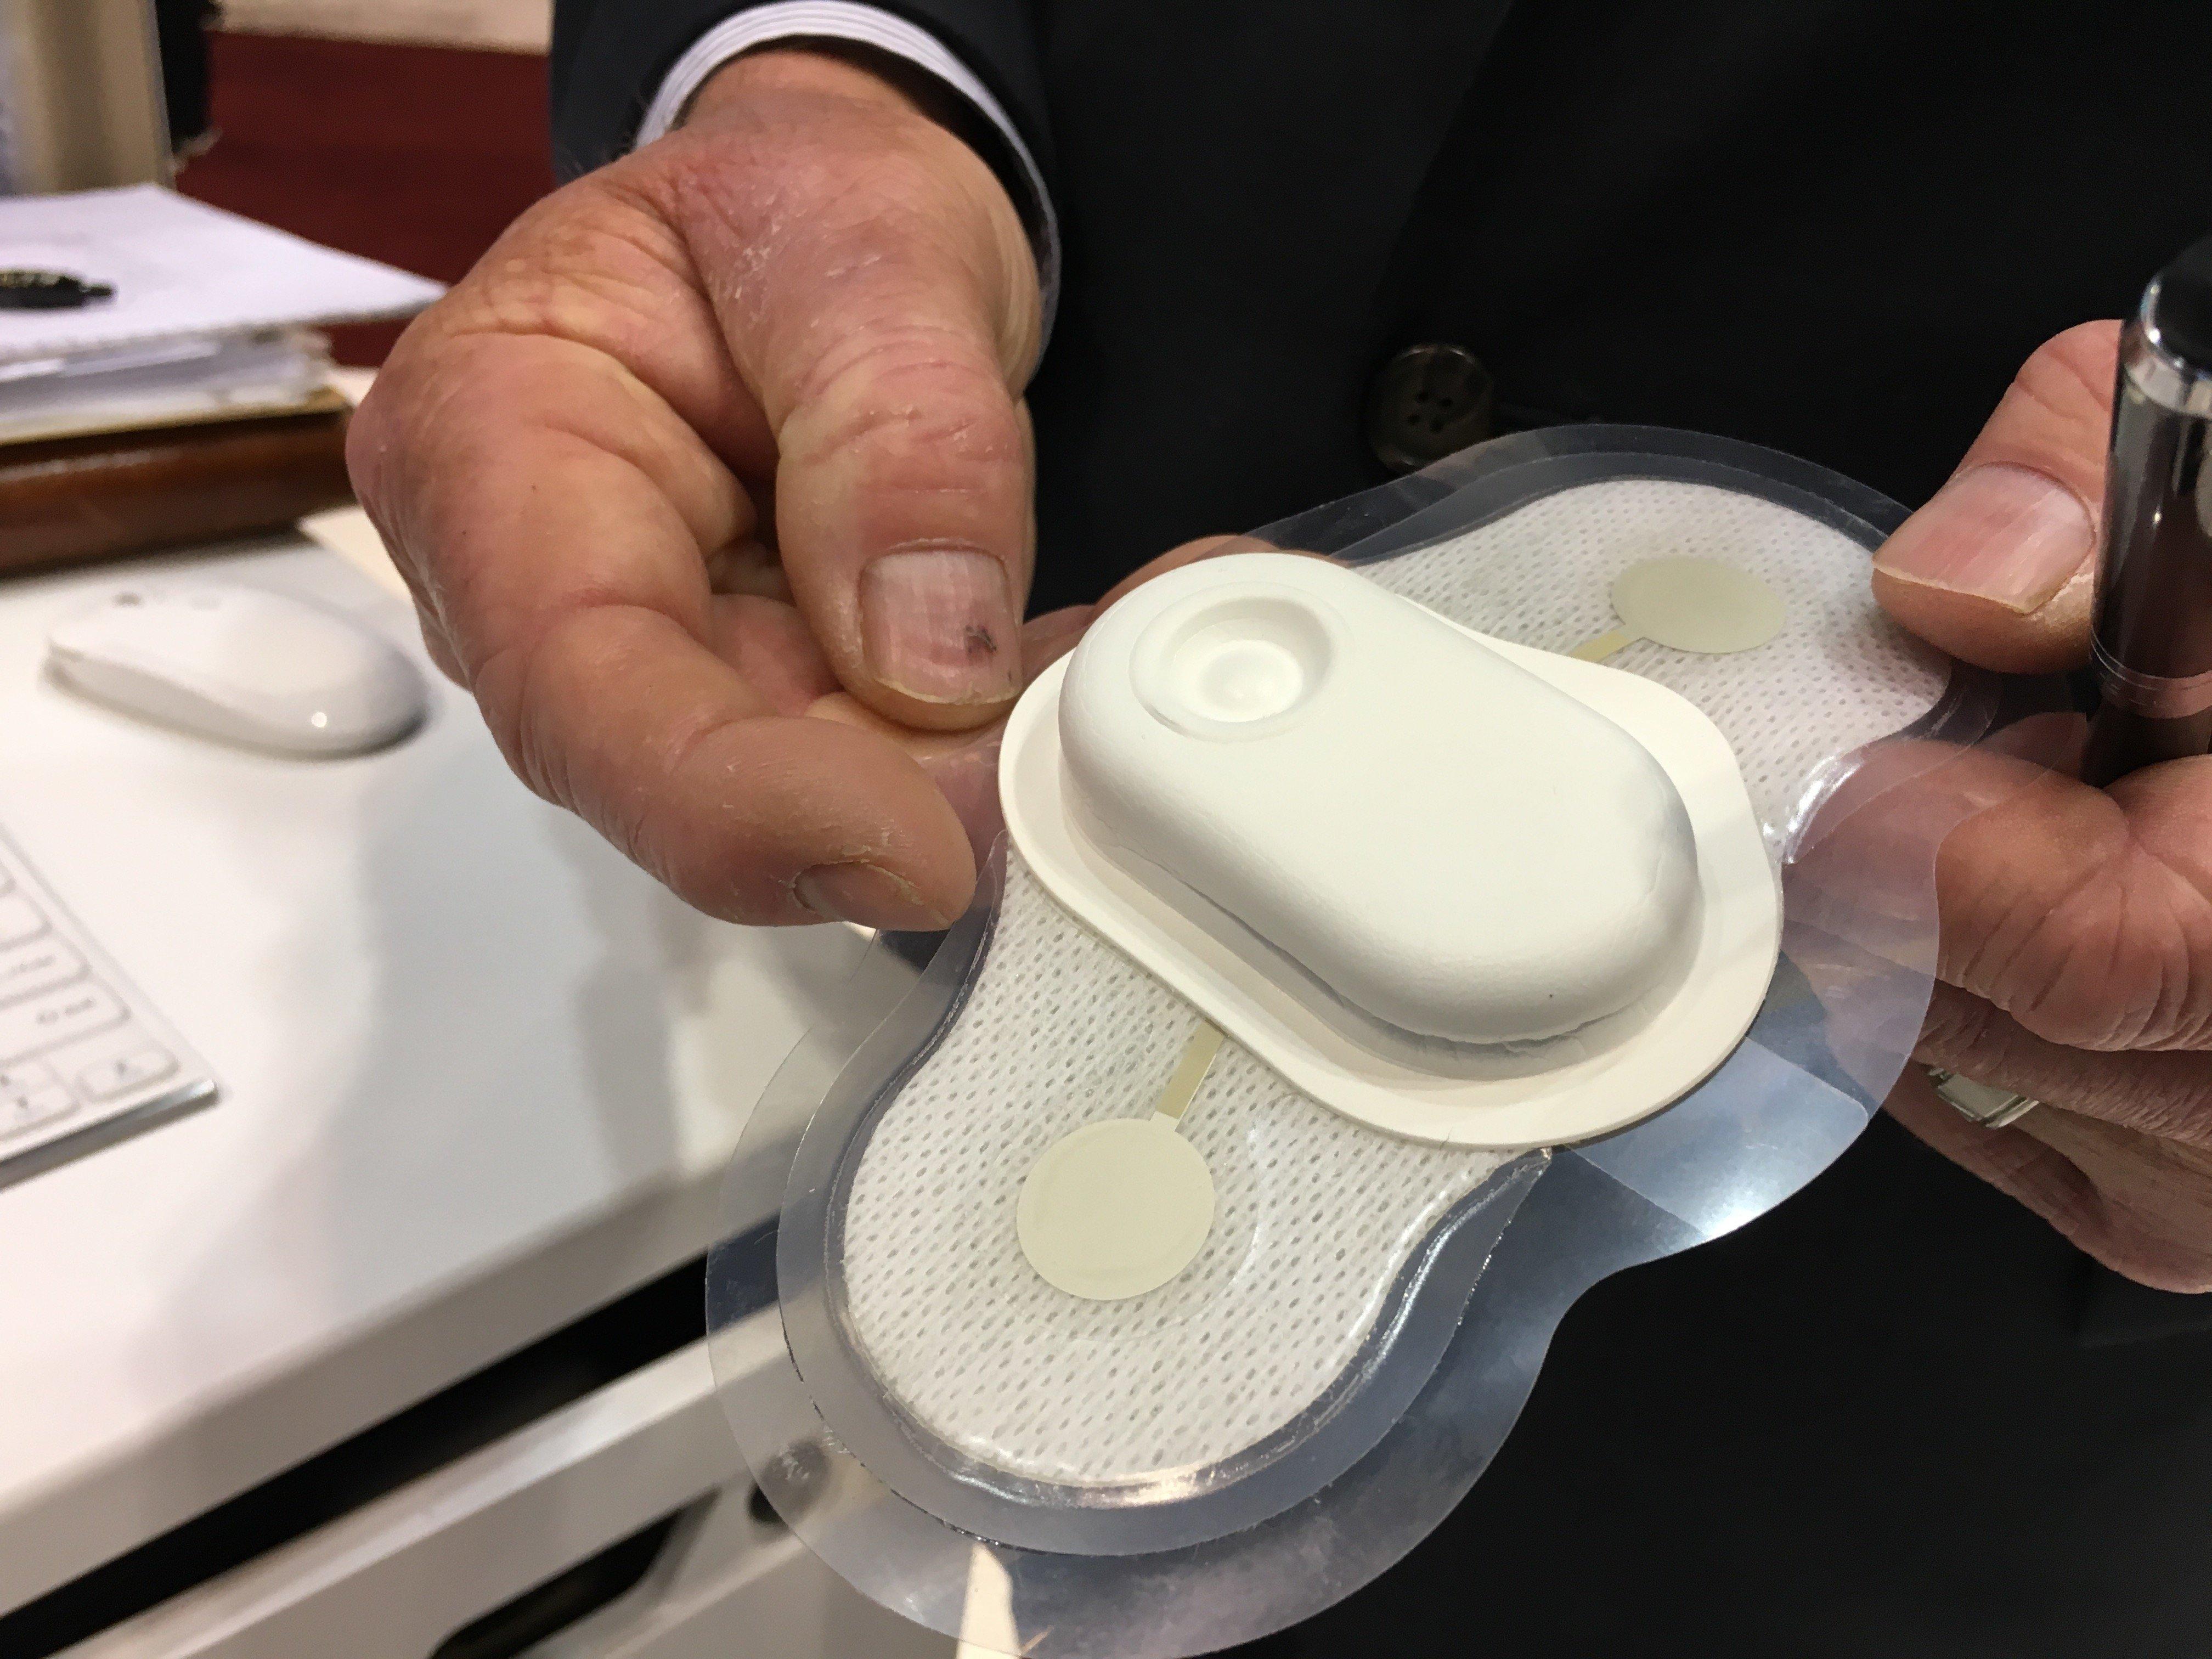 Longer Continuous Ambulatory Cardiac Monitoring Enables More Comprehensive  Evaluation of Atrial Fibrillation   DAIC